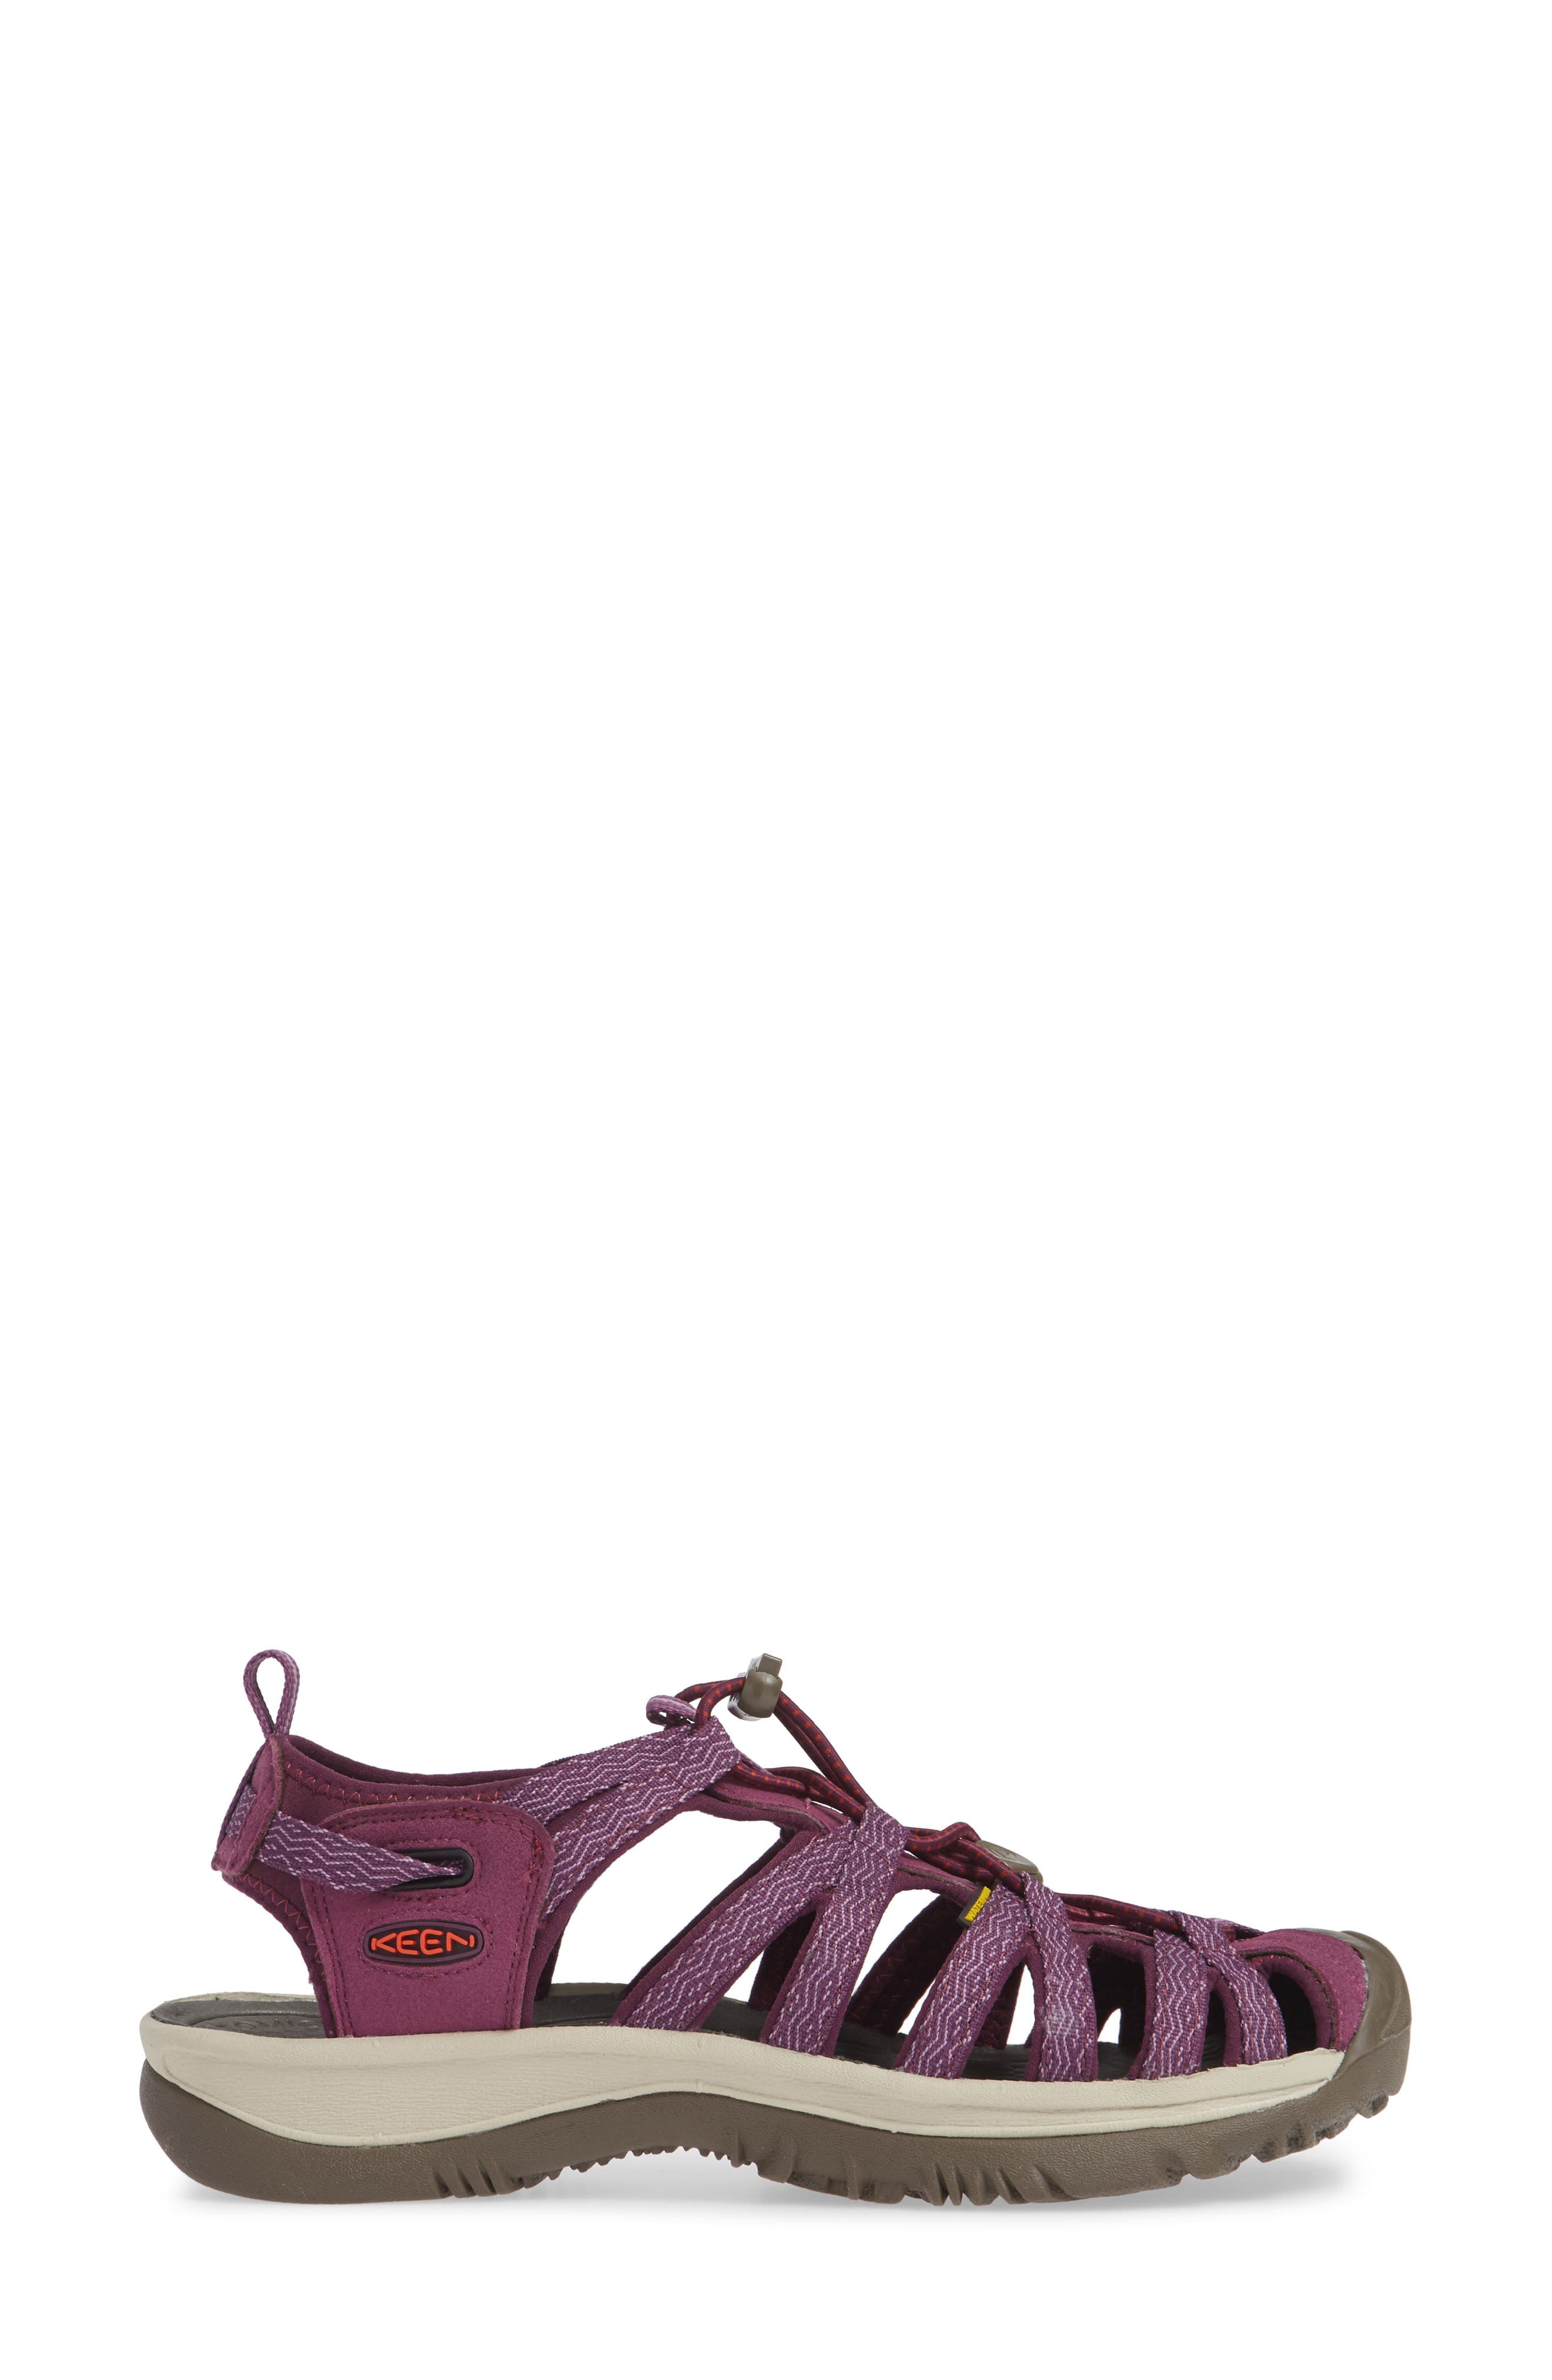 'Whisper' Water Friendly Sport Sandal,                             Alternate thumbnail 6, color,                             Grape Kiss/ Grape Wine